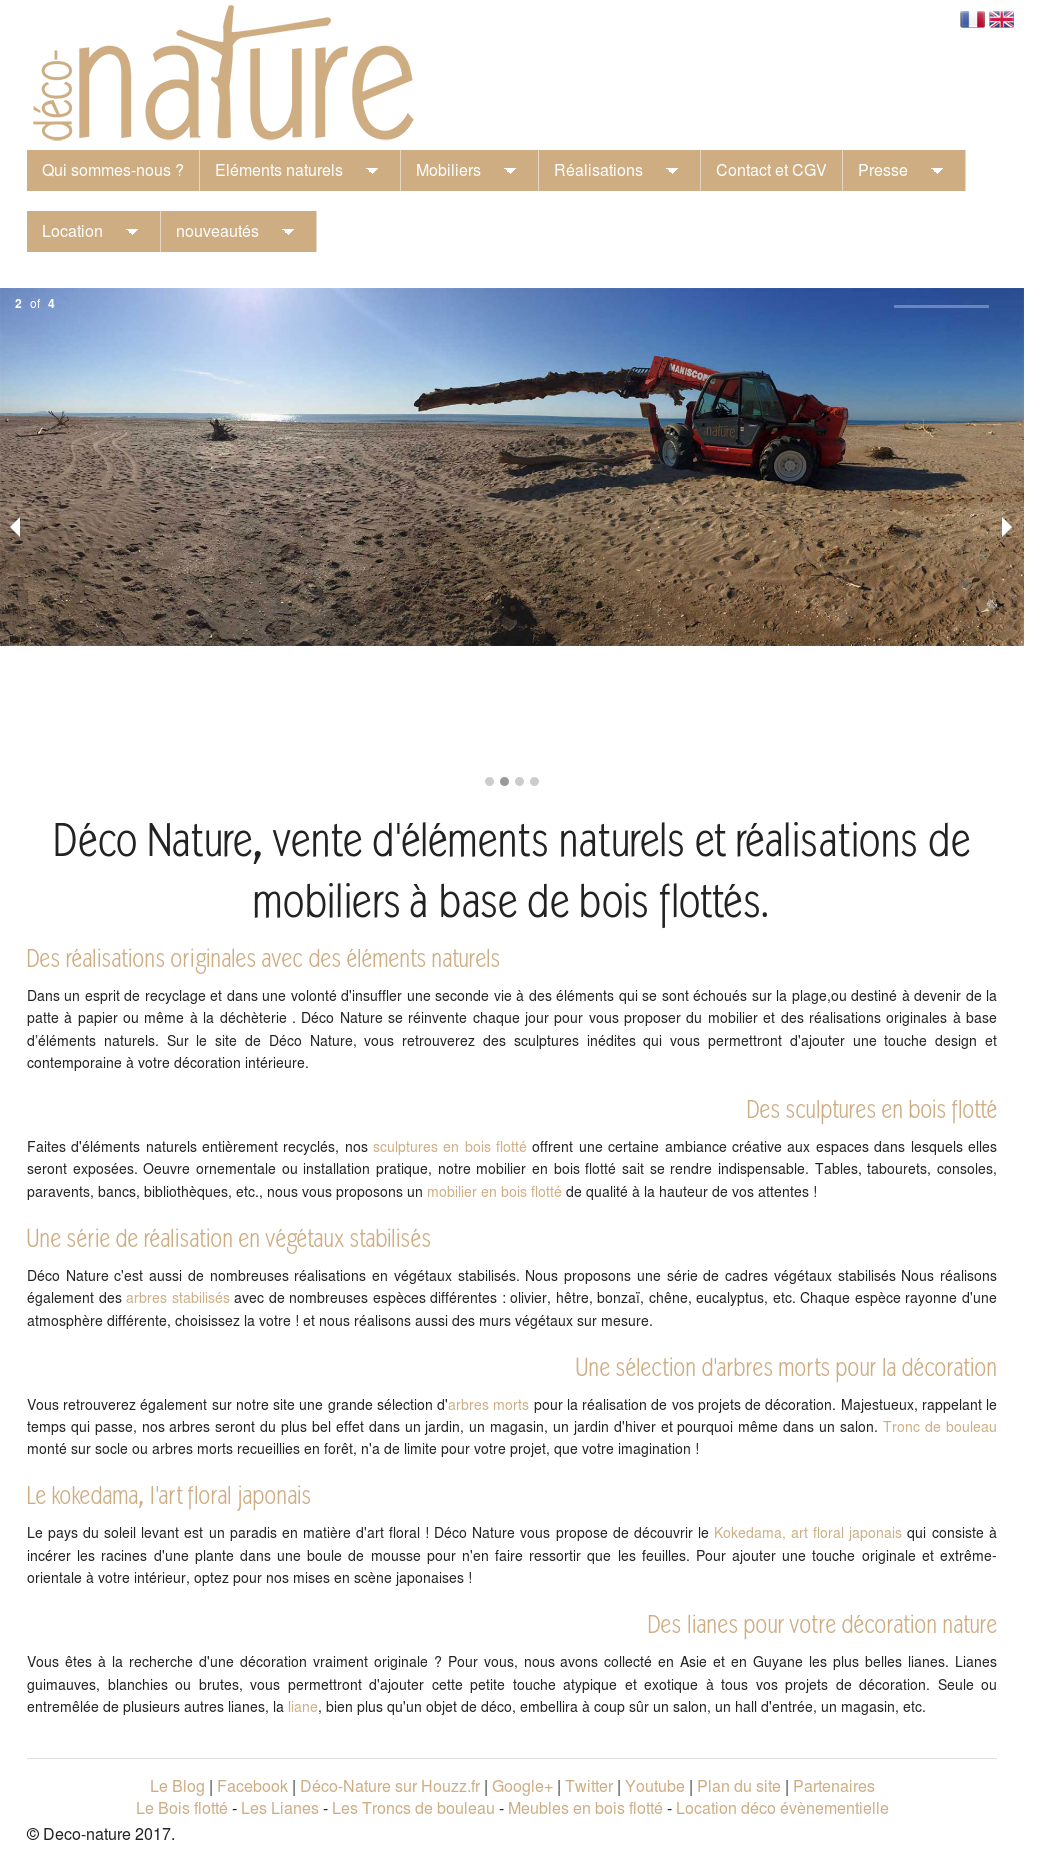 Deco Nature Competitors, Revenue And Employees   Owler Company Profile